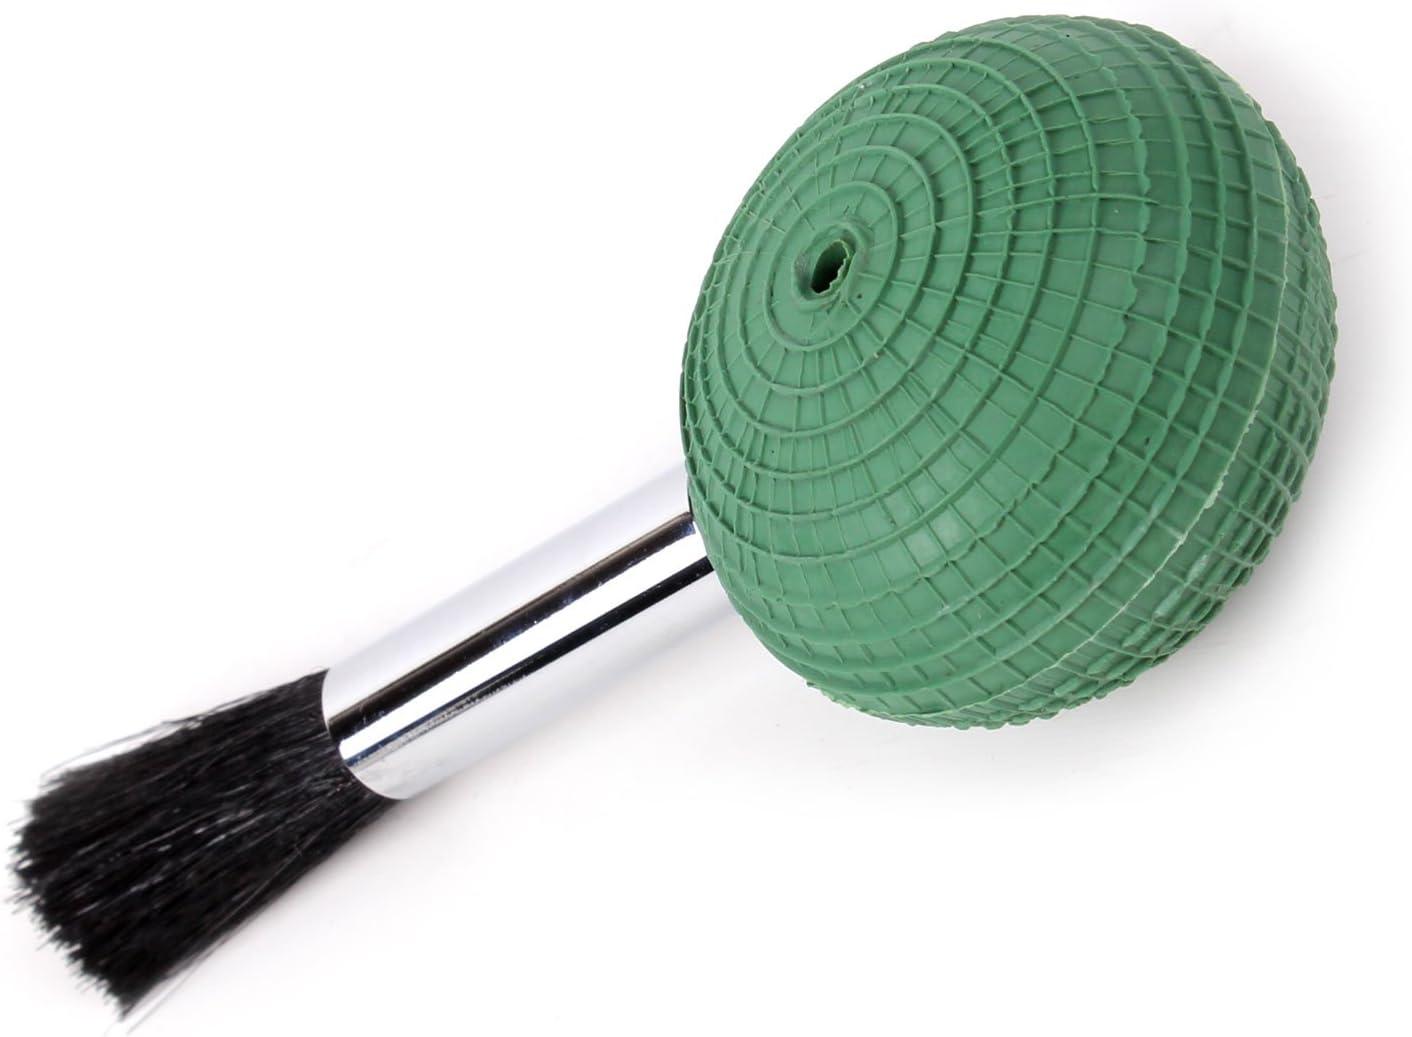 DURAGADGET Camera Lens Blower Brush Cleaning Pen for The New Panasonic GF7 /& Panasonic LUMIX DMC-FZ1000 2014 Release